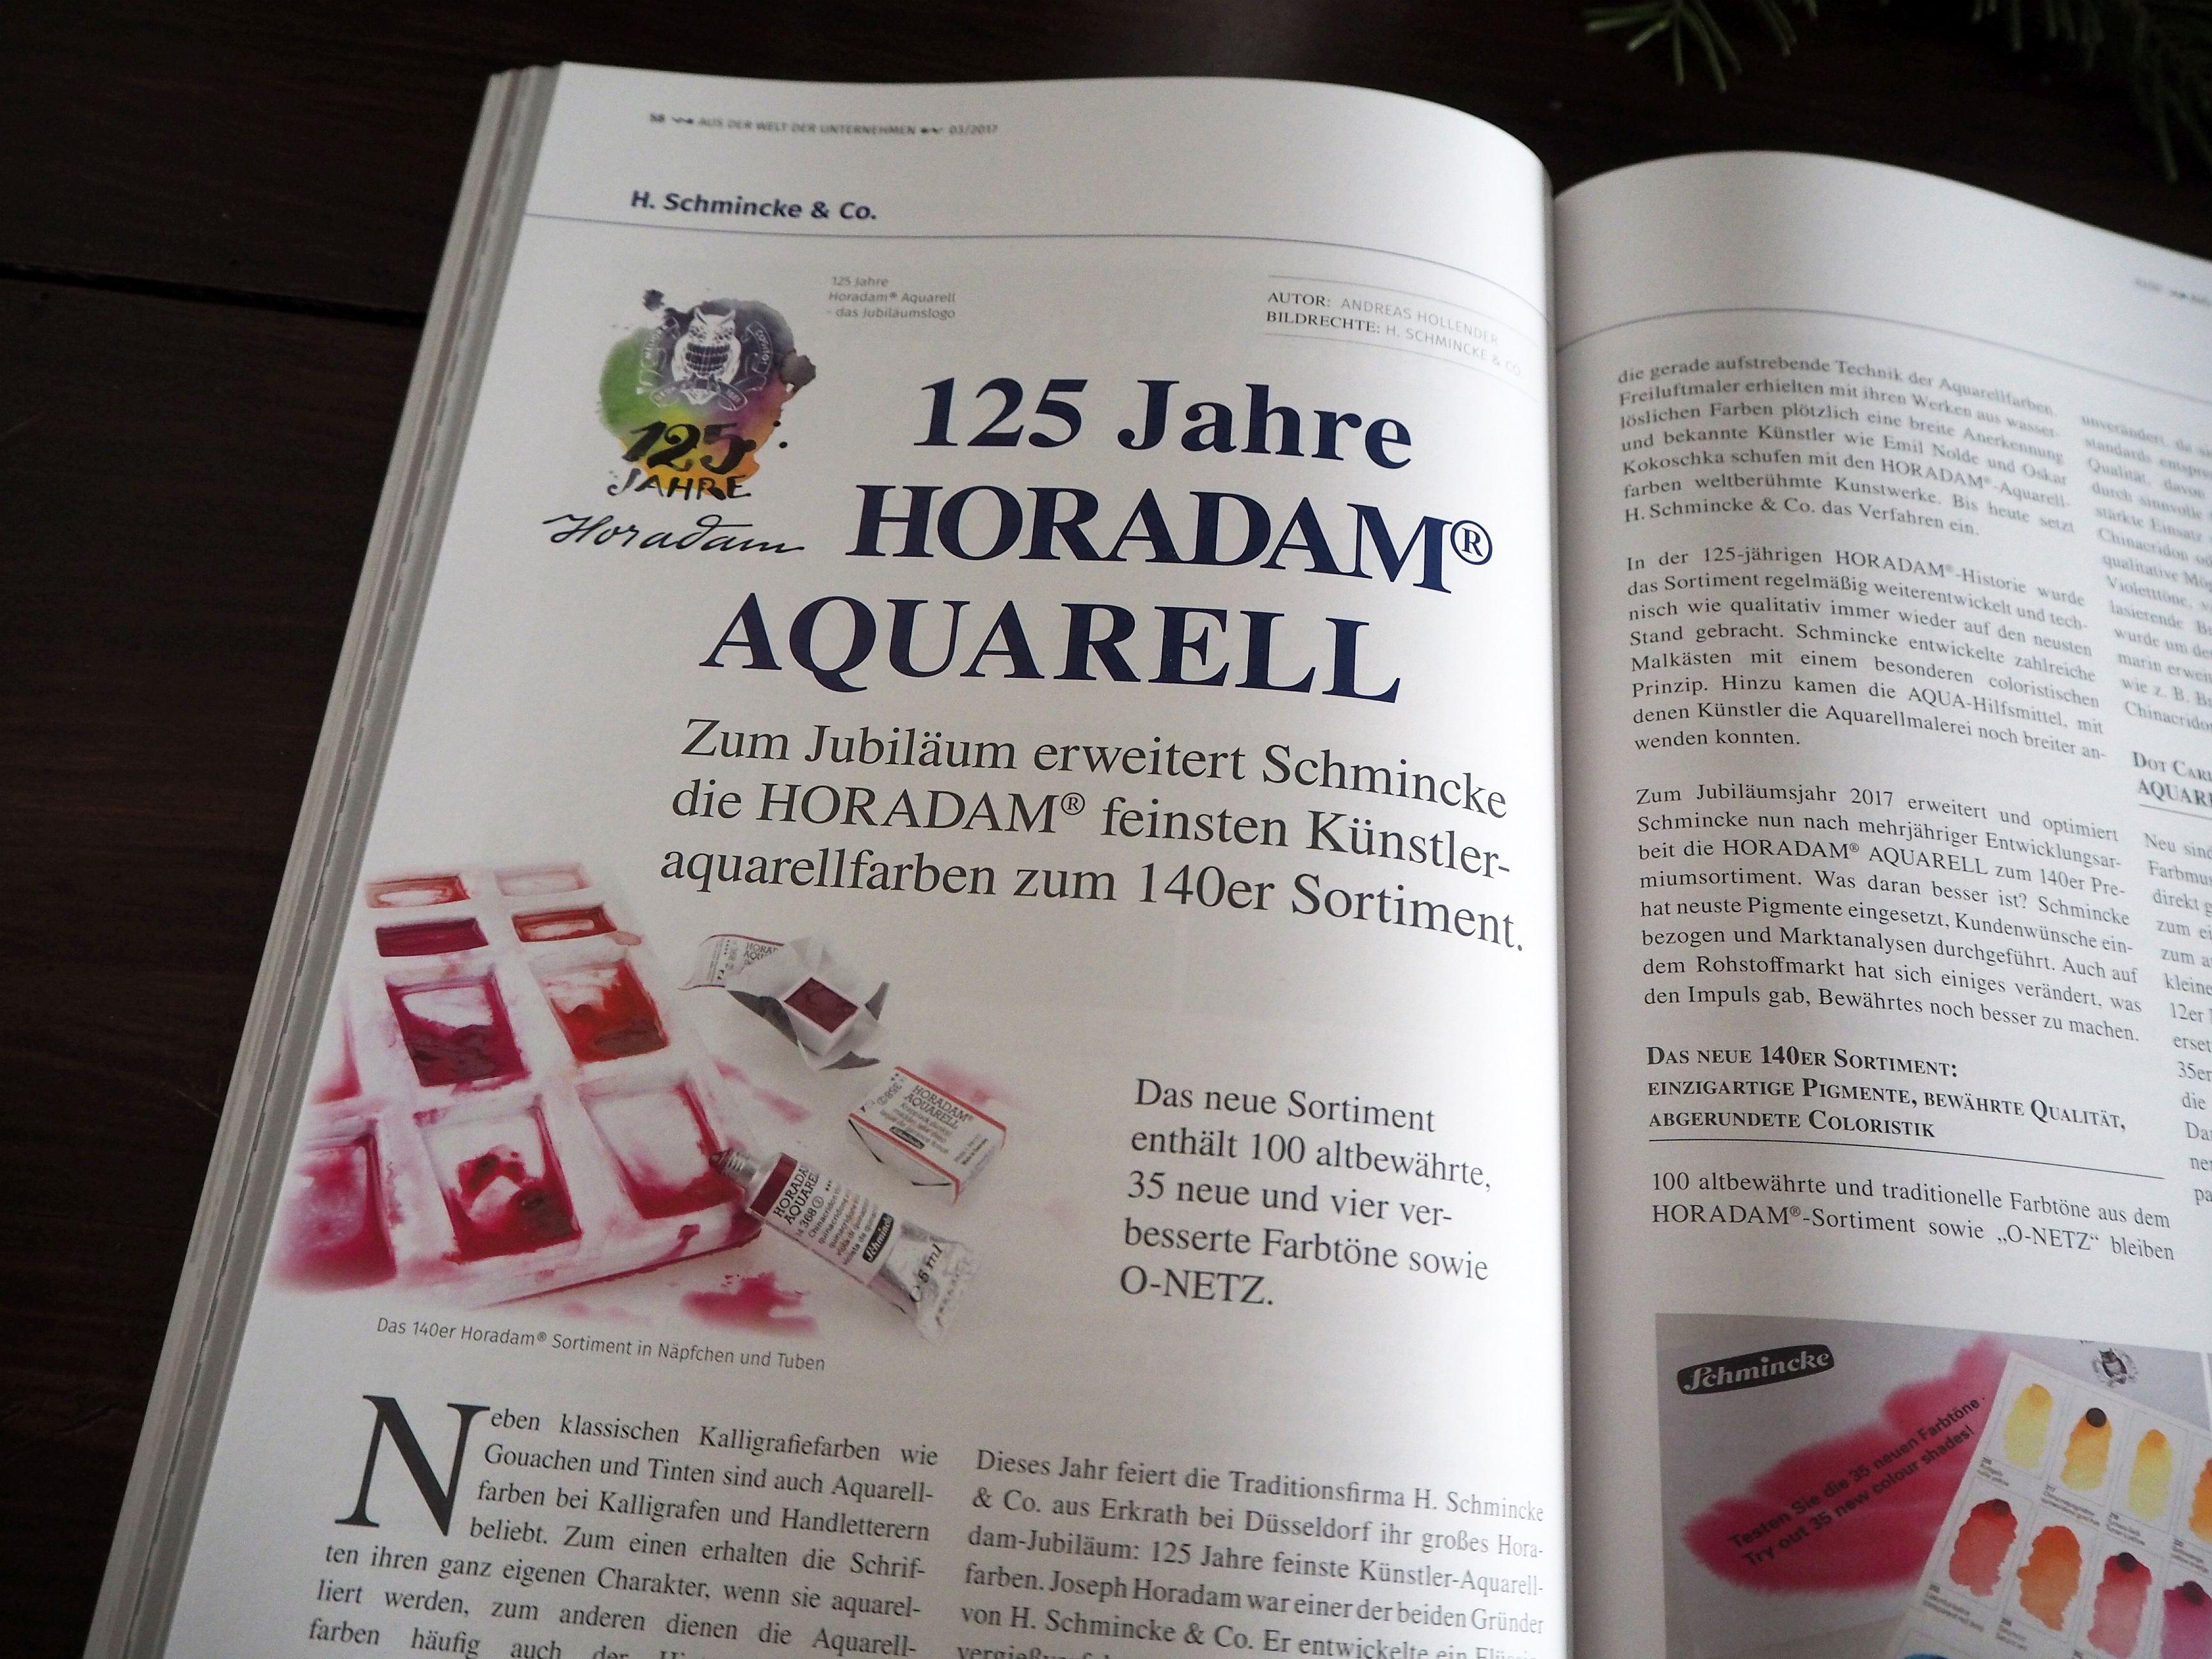 2017-12-skoen-och-kreativ-sonntagslektuere-zeitschrift-kalligrafie-aktuell (16)